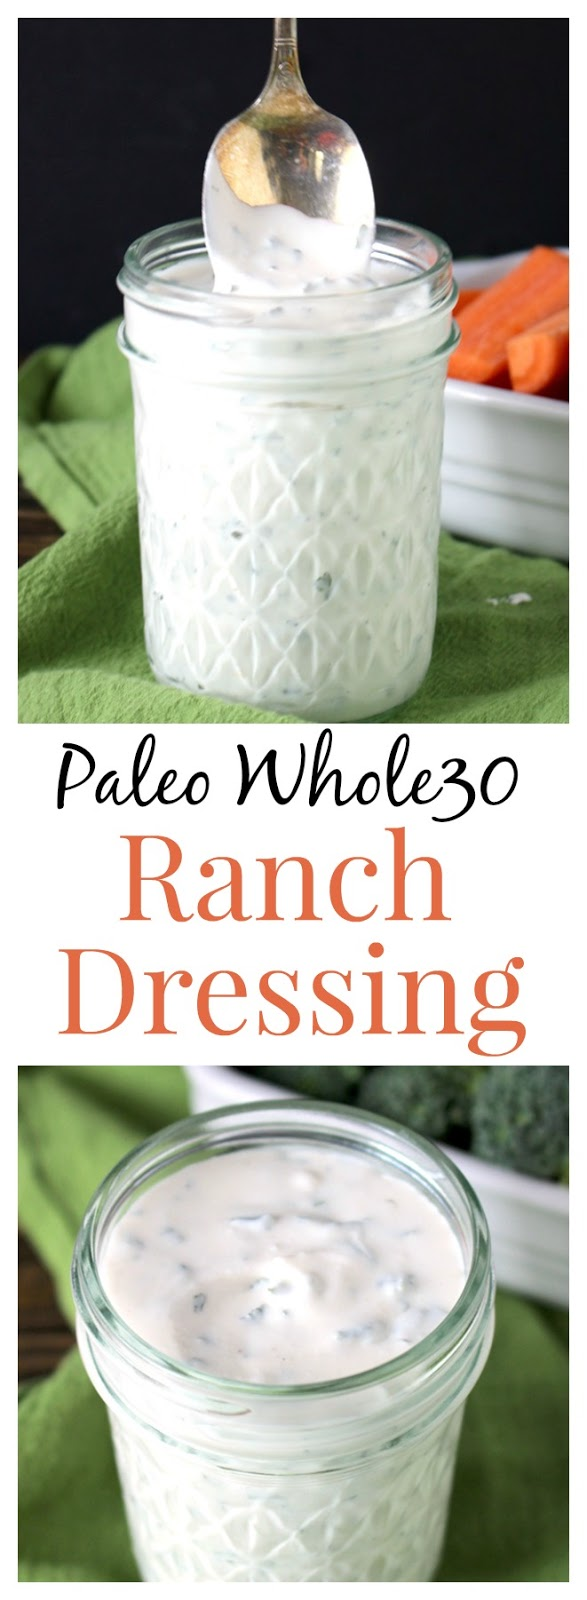 PALEO WHOLE30 RANCH DRESSING